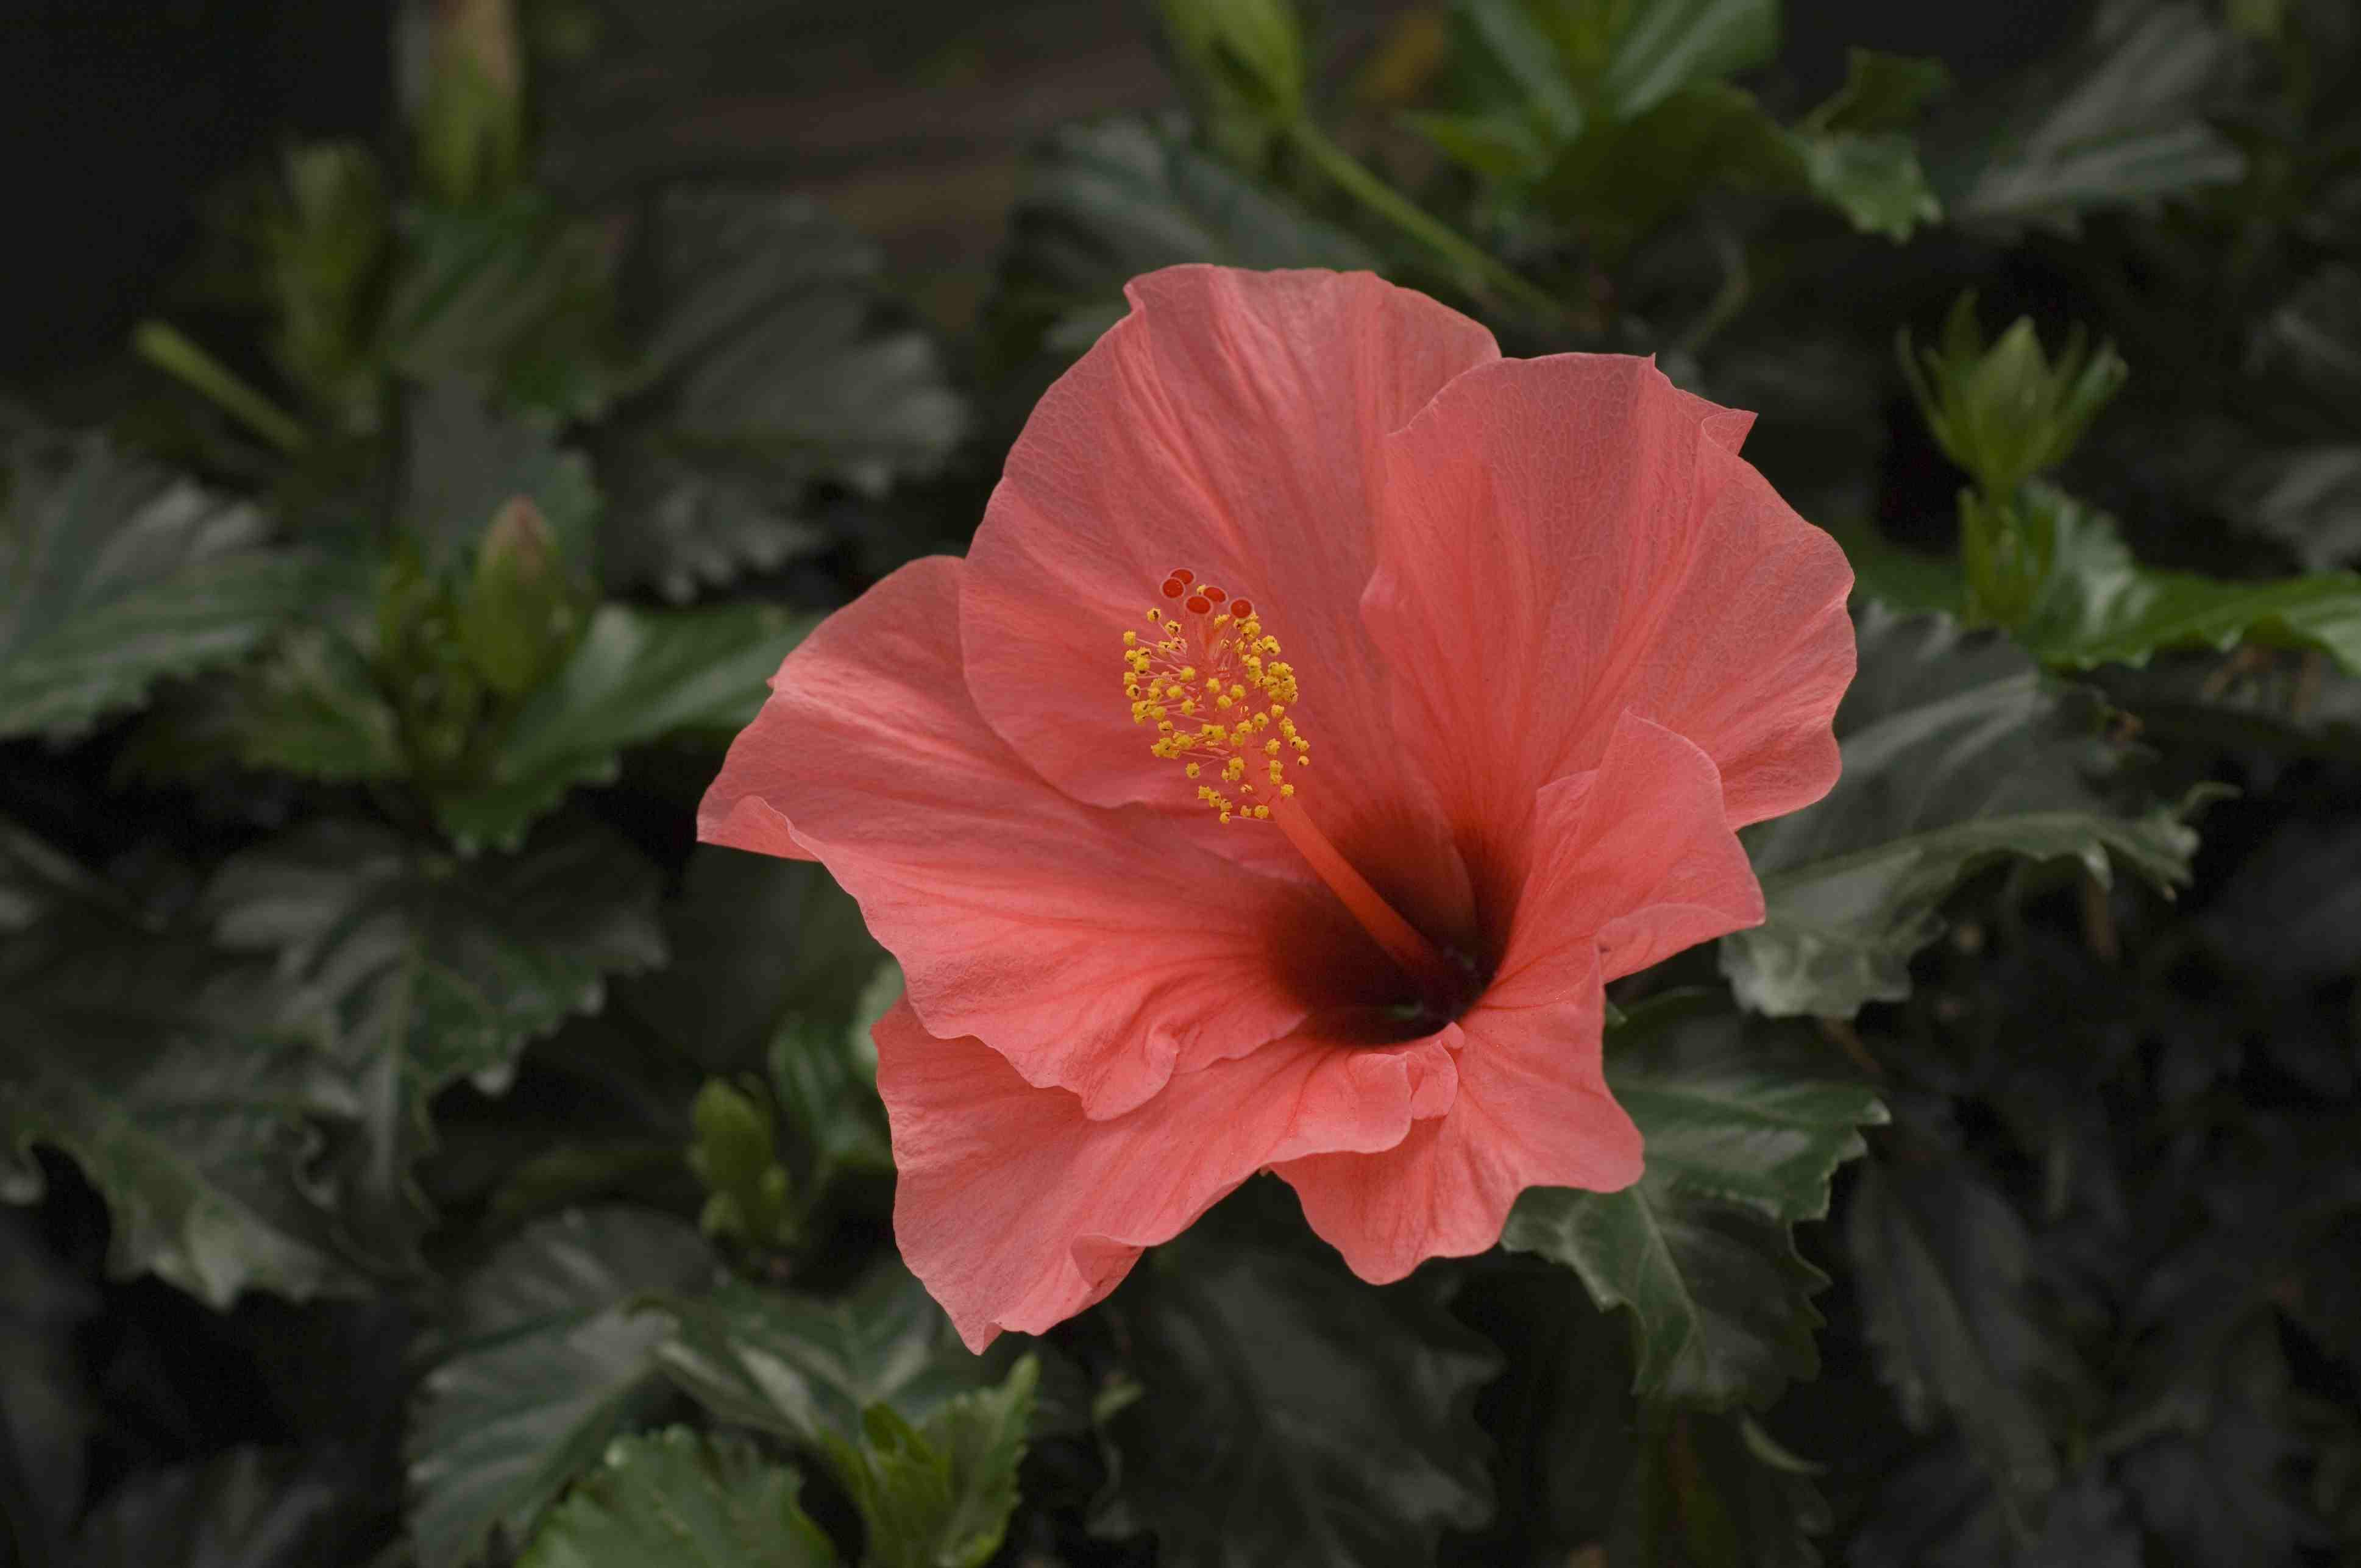 hibiscus 56a08ed63df78cafdaa2b507